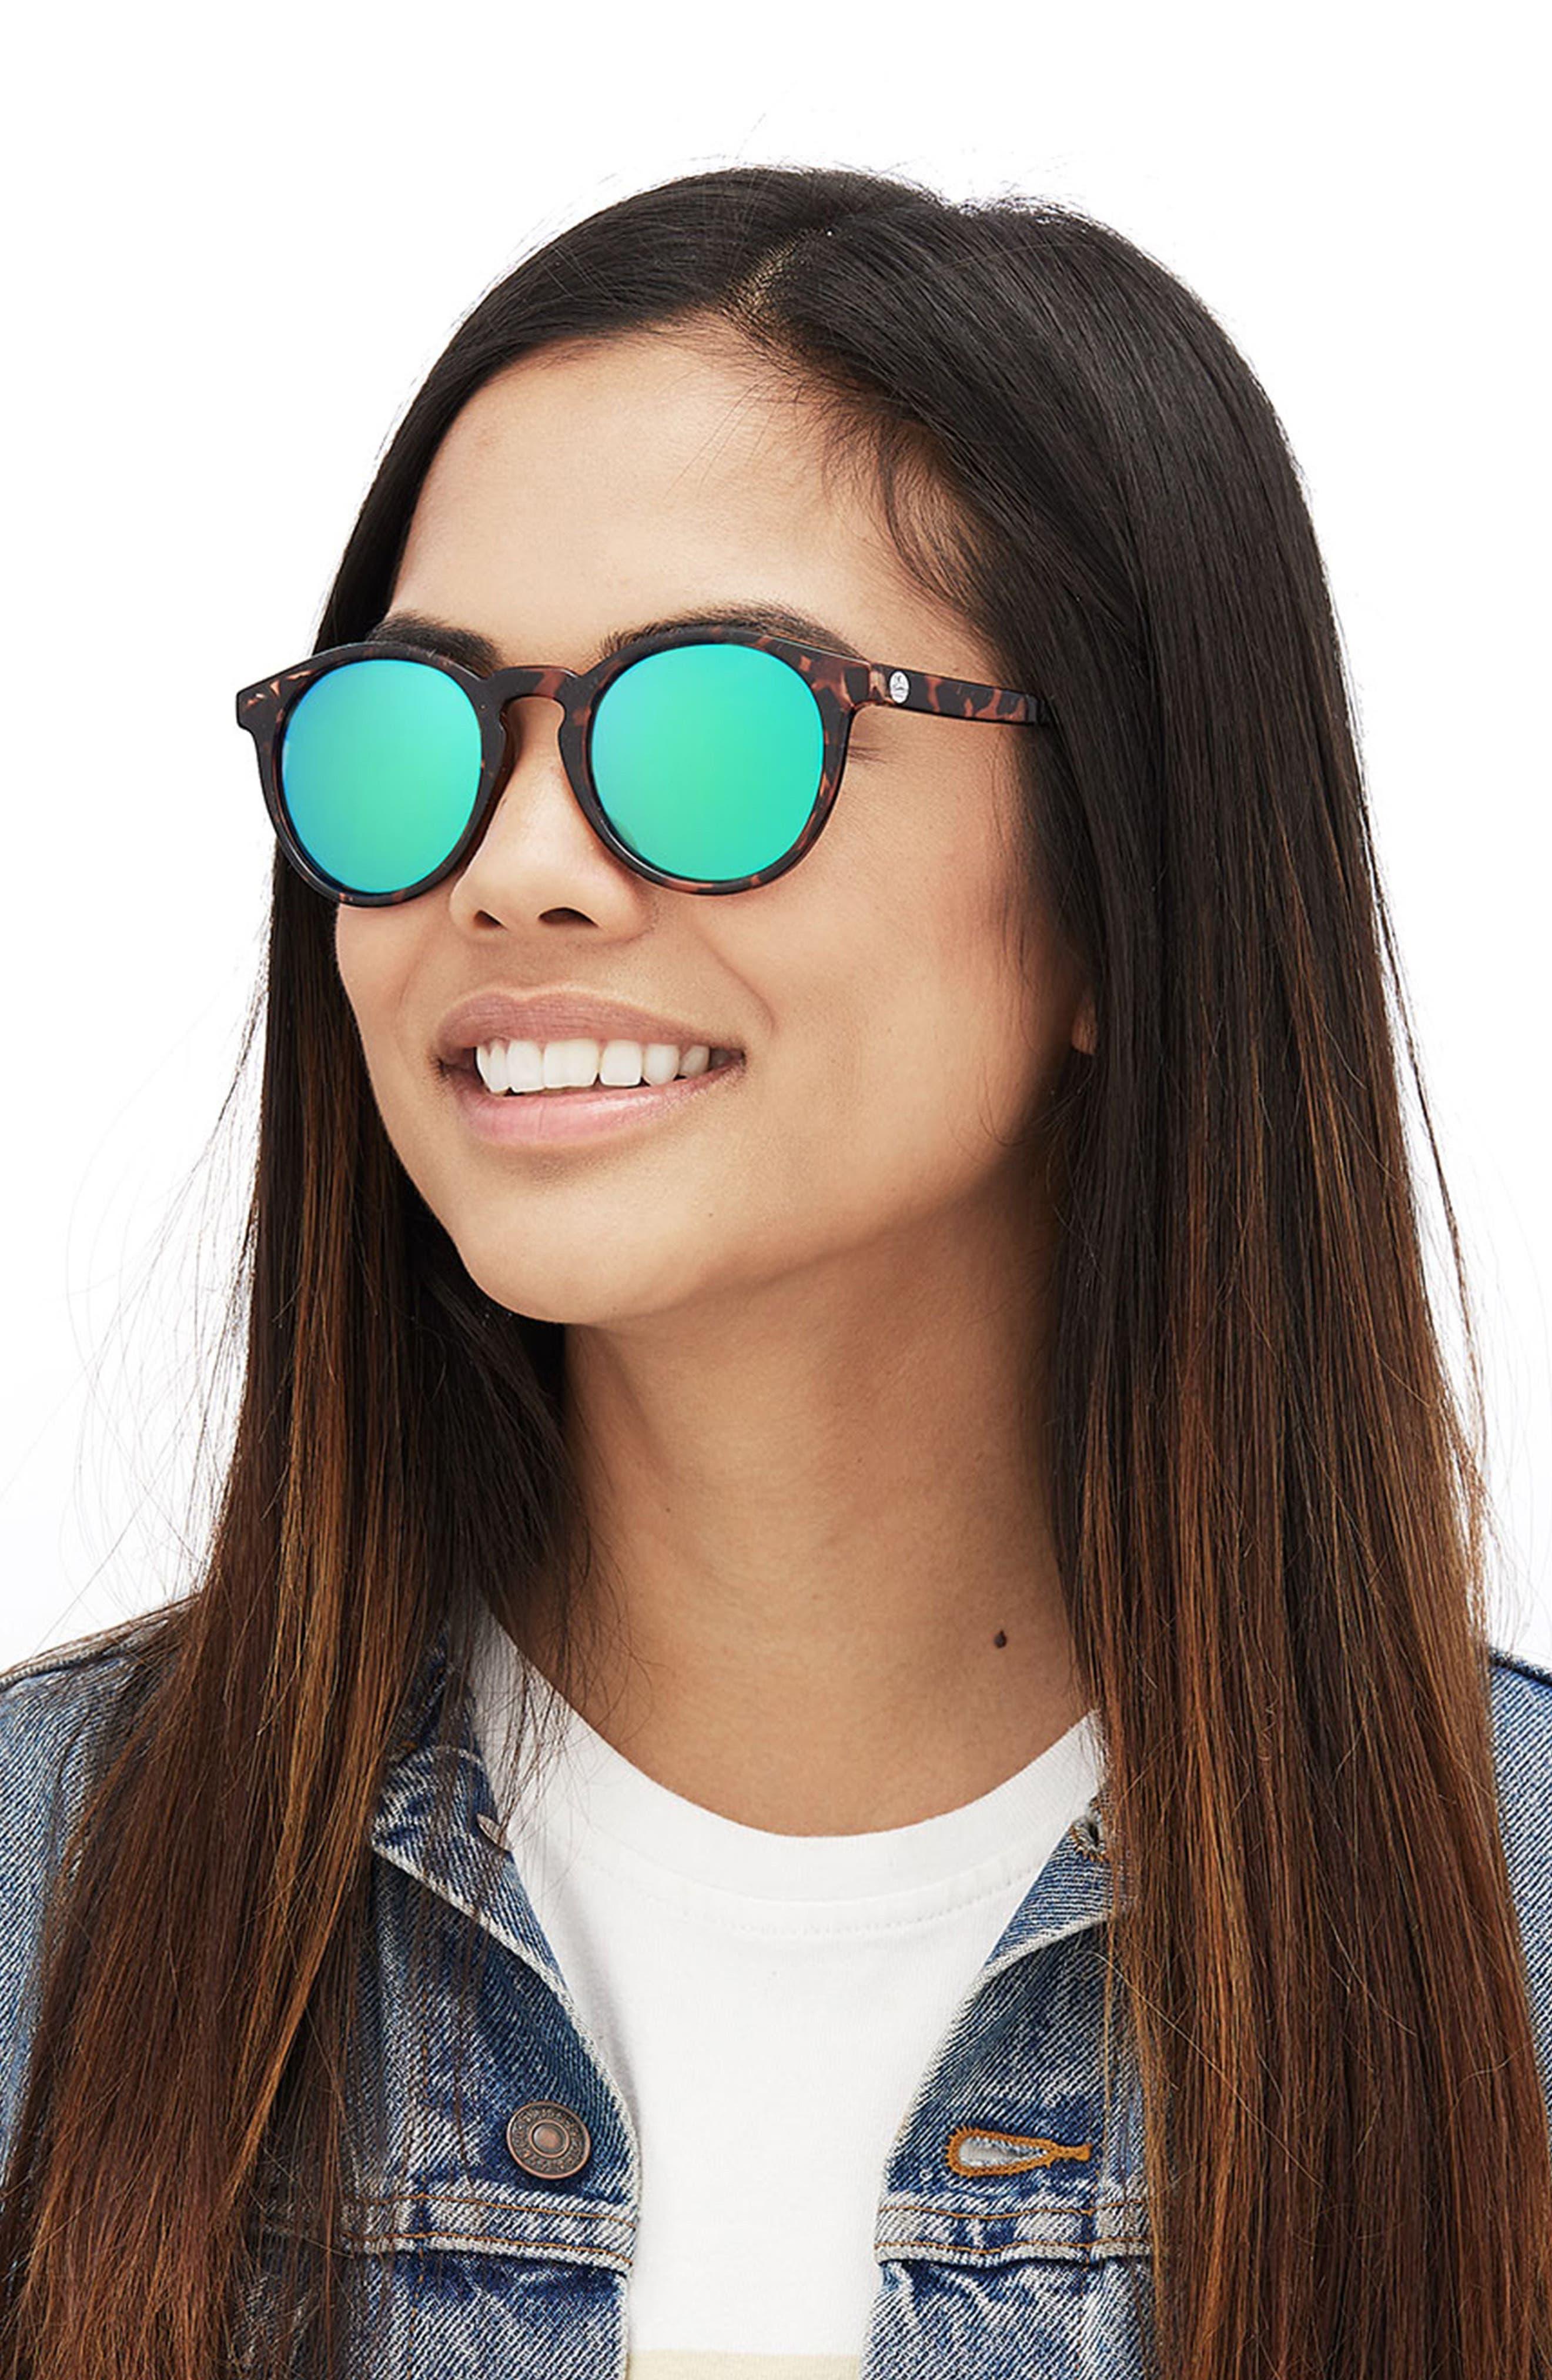 Dipsea 48mm Polarized Sunglasses,                             Alternate thumbnail 6, color,                             TORTOISE EMERALD